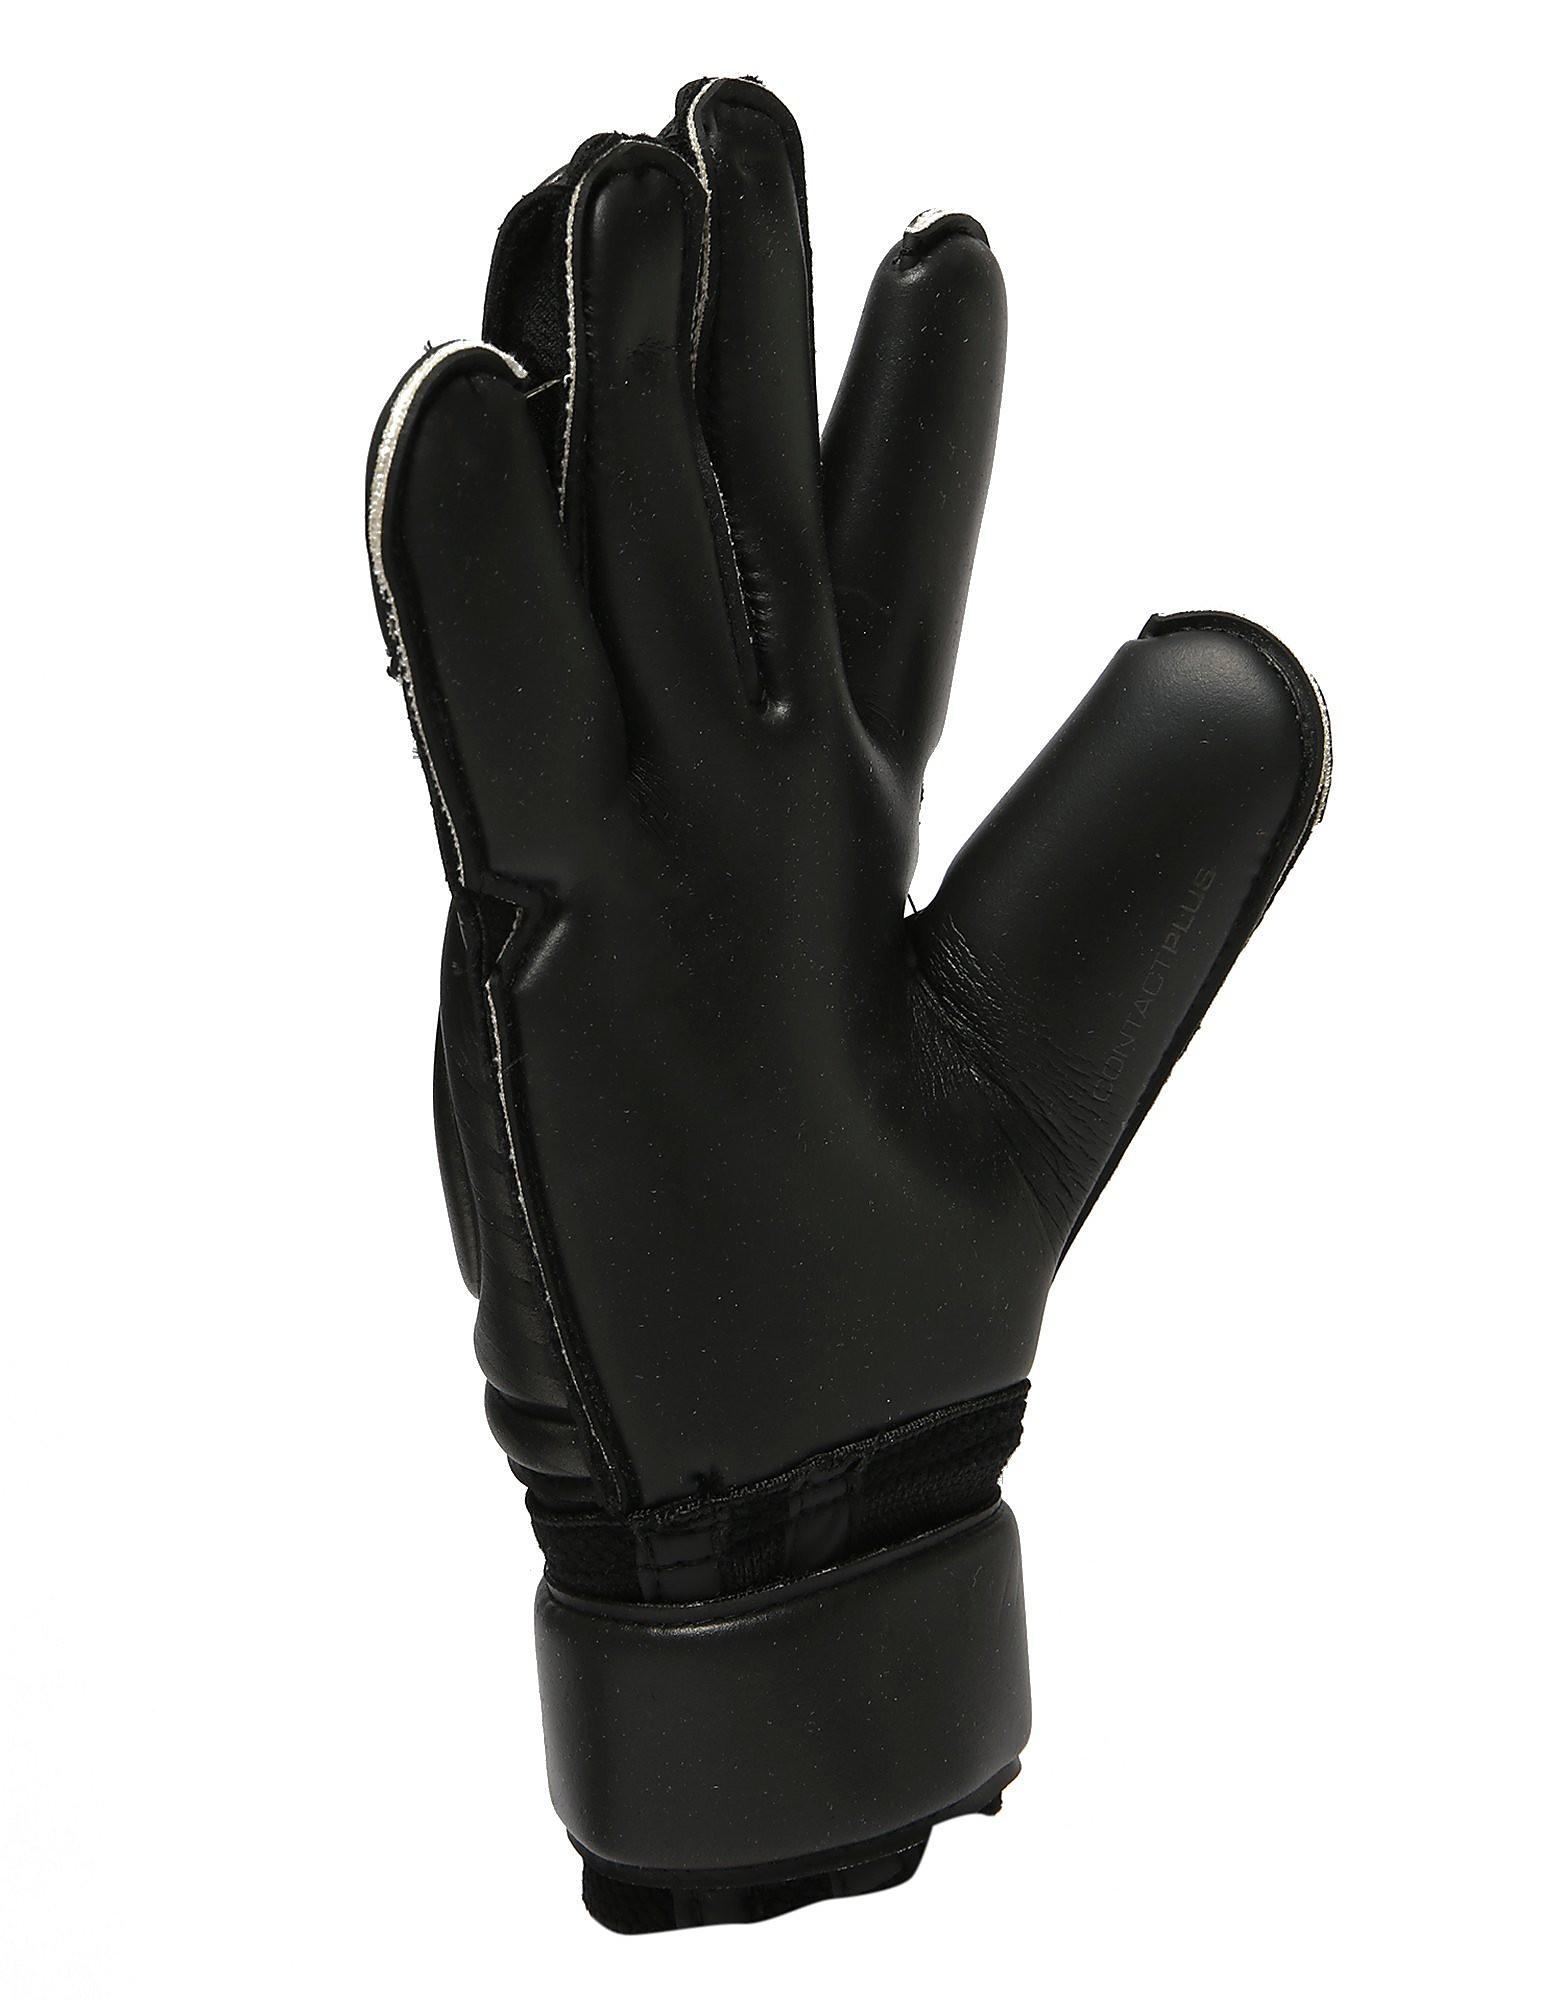 Nike guantes de portero Vapor Grip3